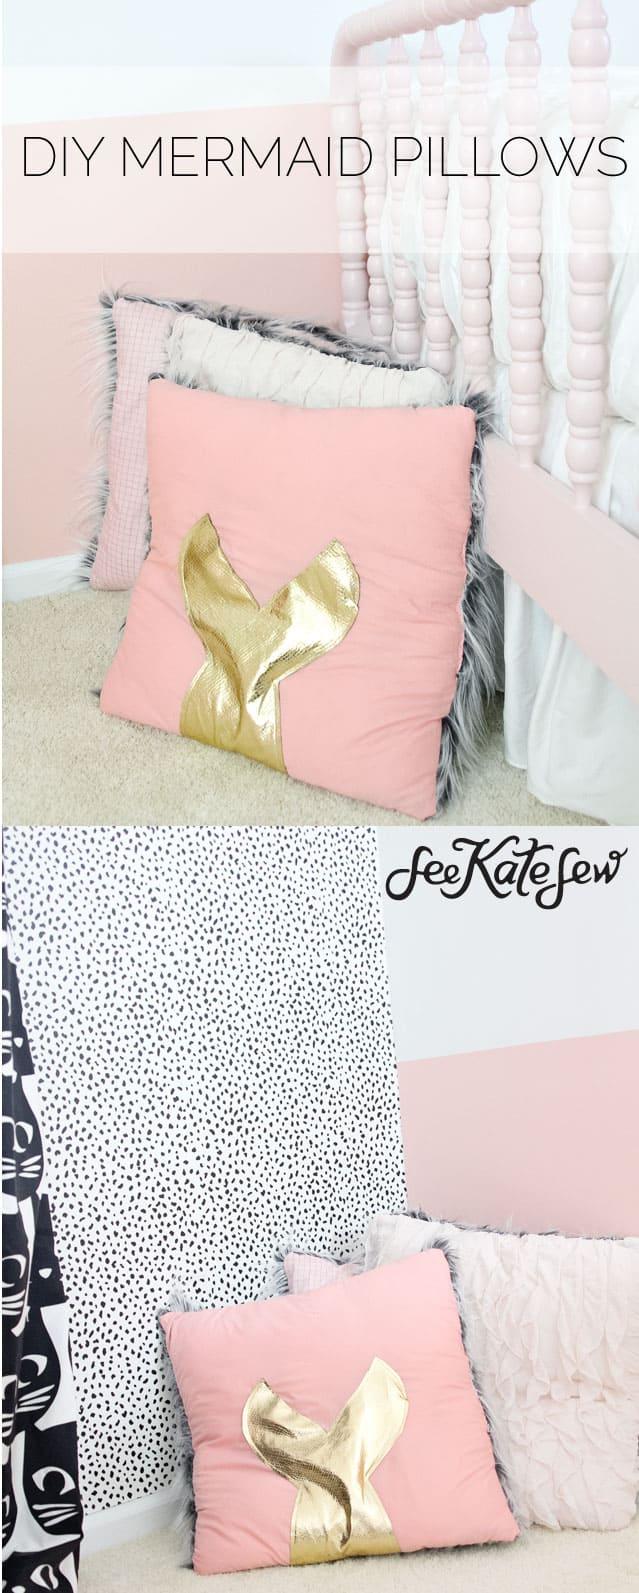 DIY Mermaid Pillows | See Kate Sew